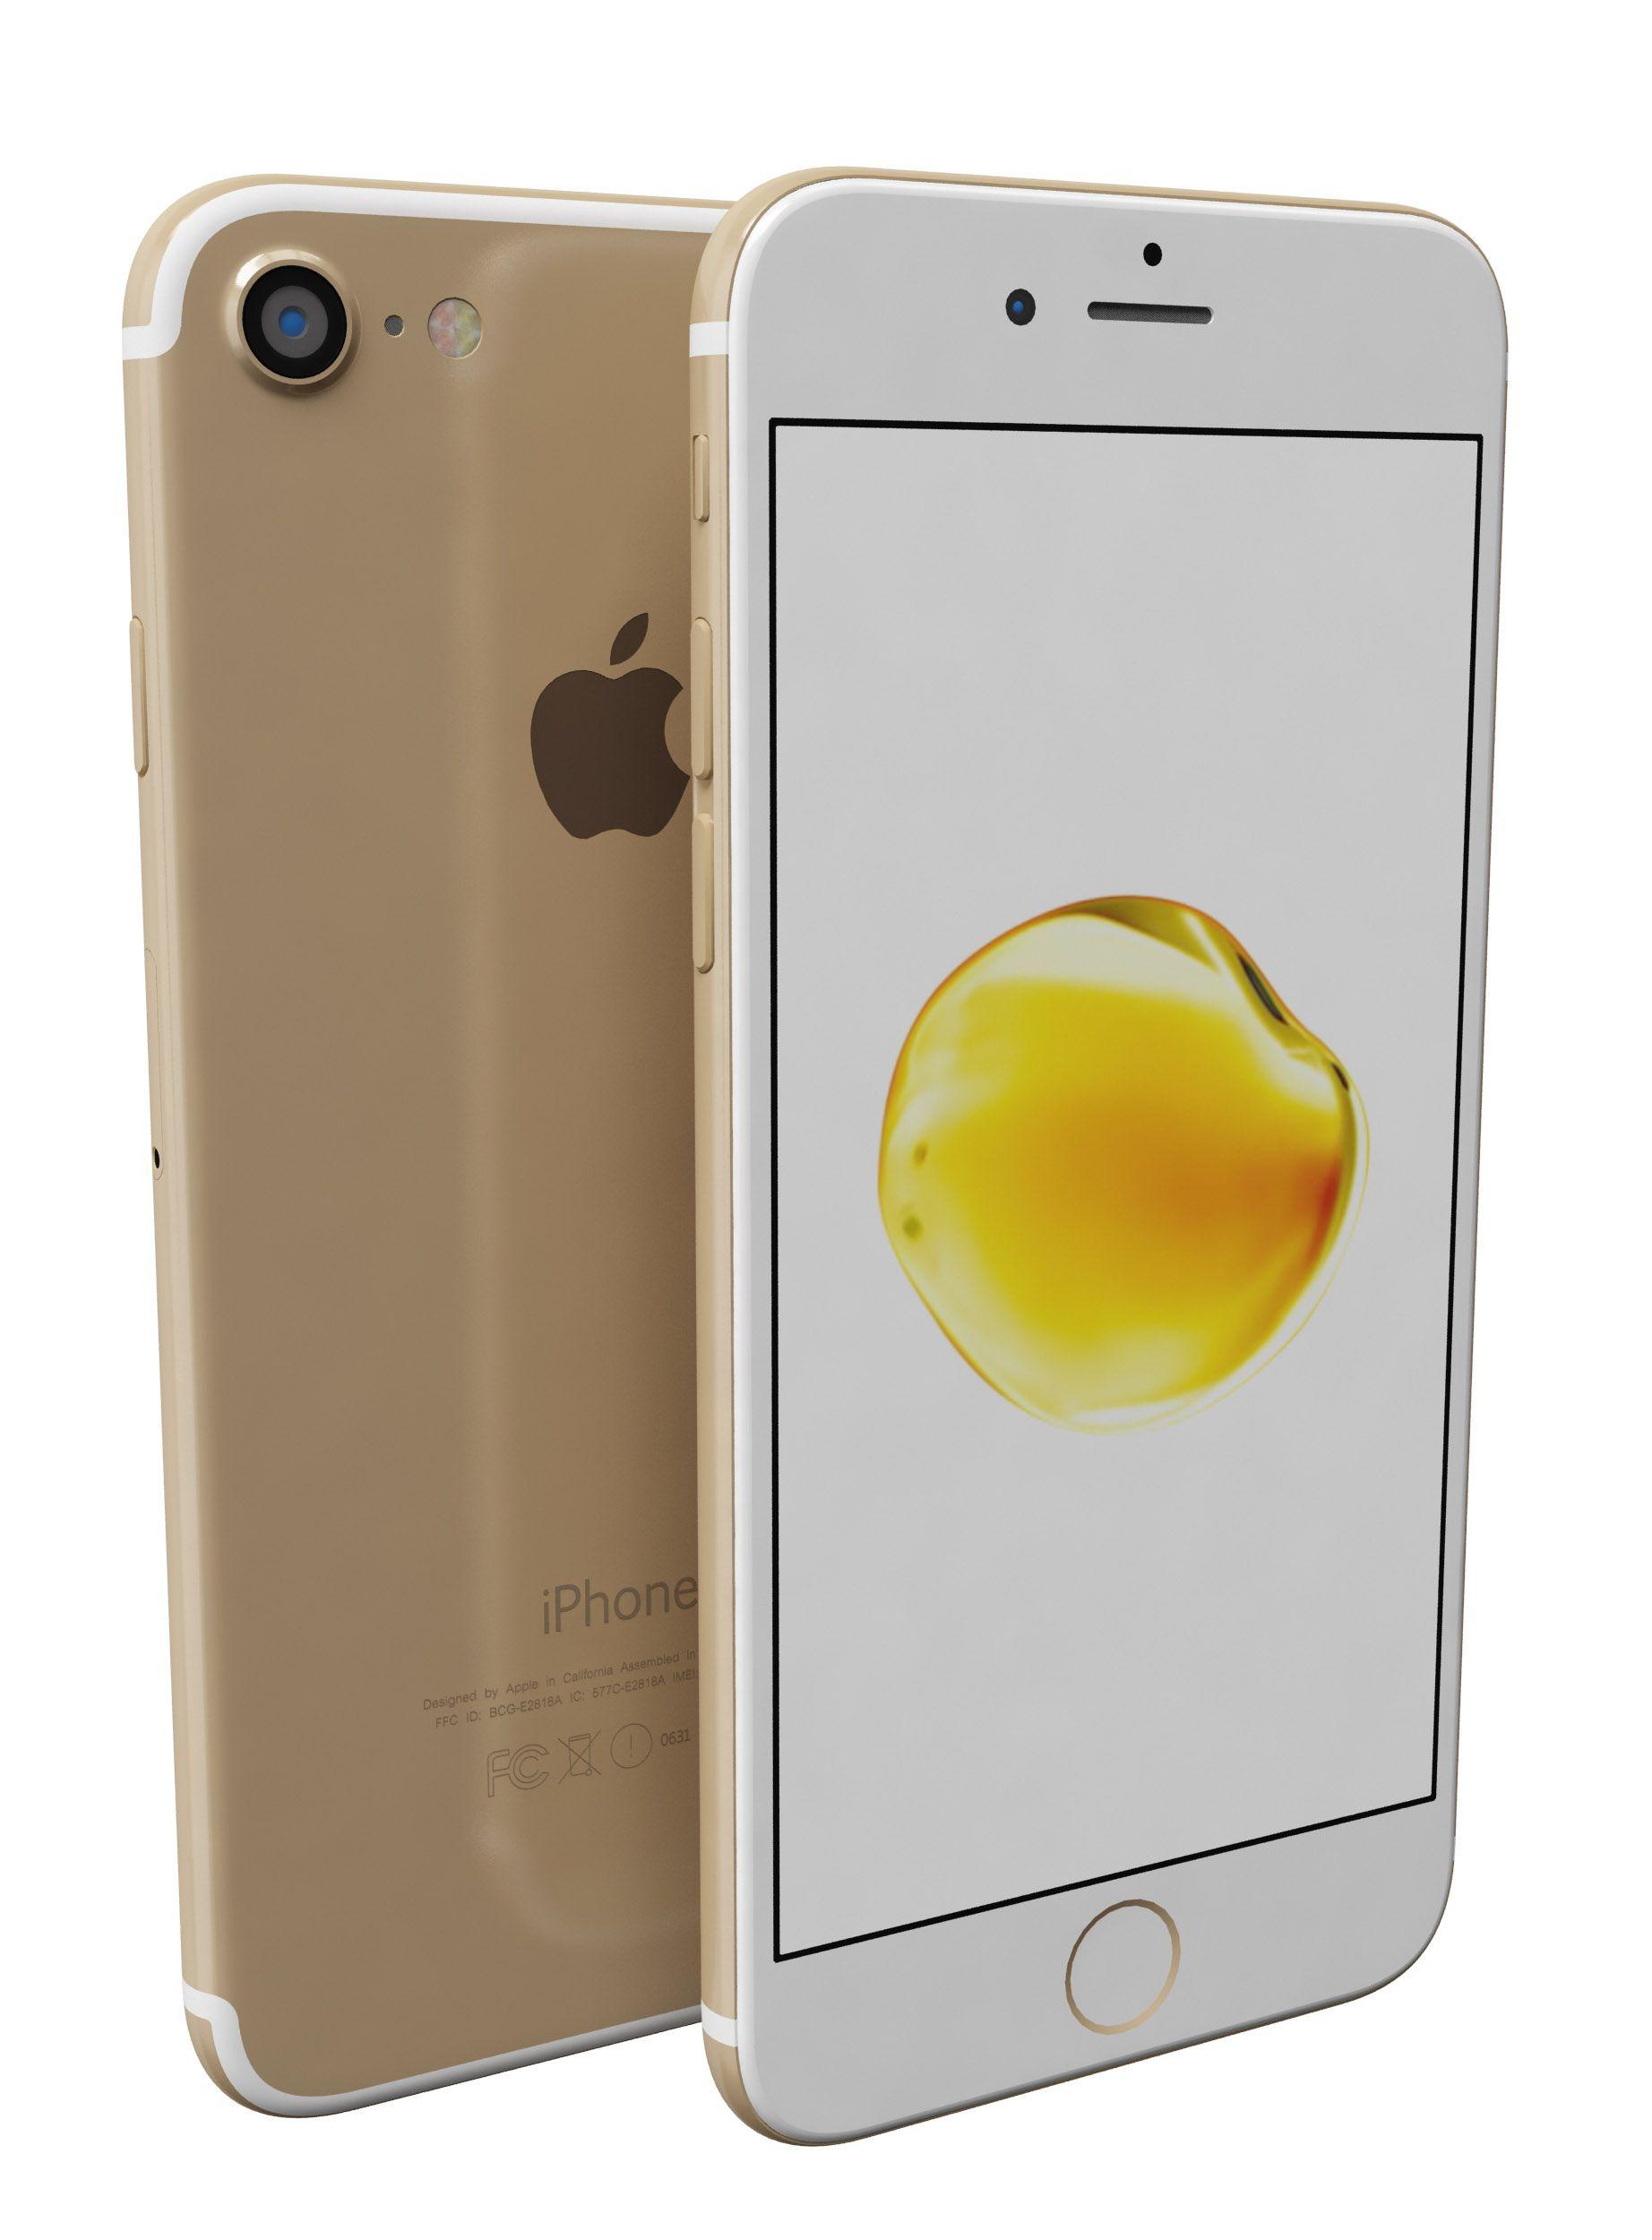 iPhone 7 3D Model iPhone, Model Iphone, Iphone 7, Buy